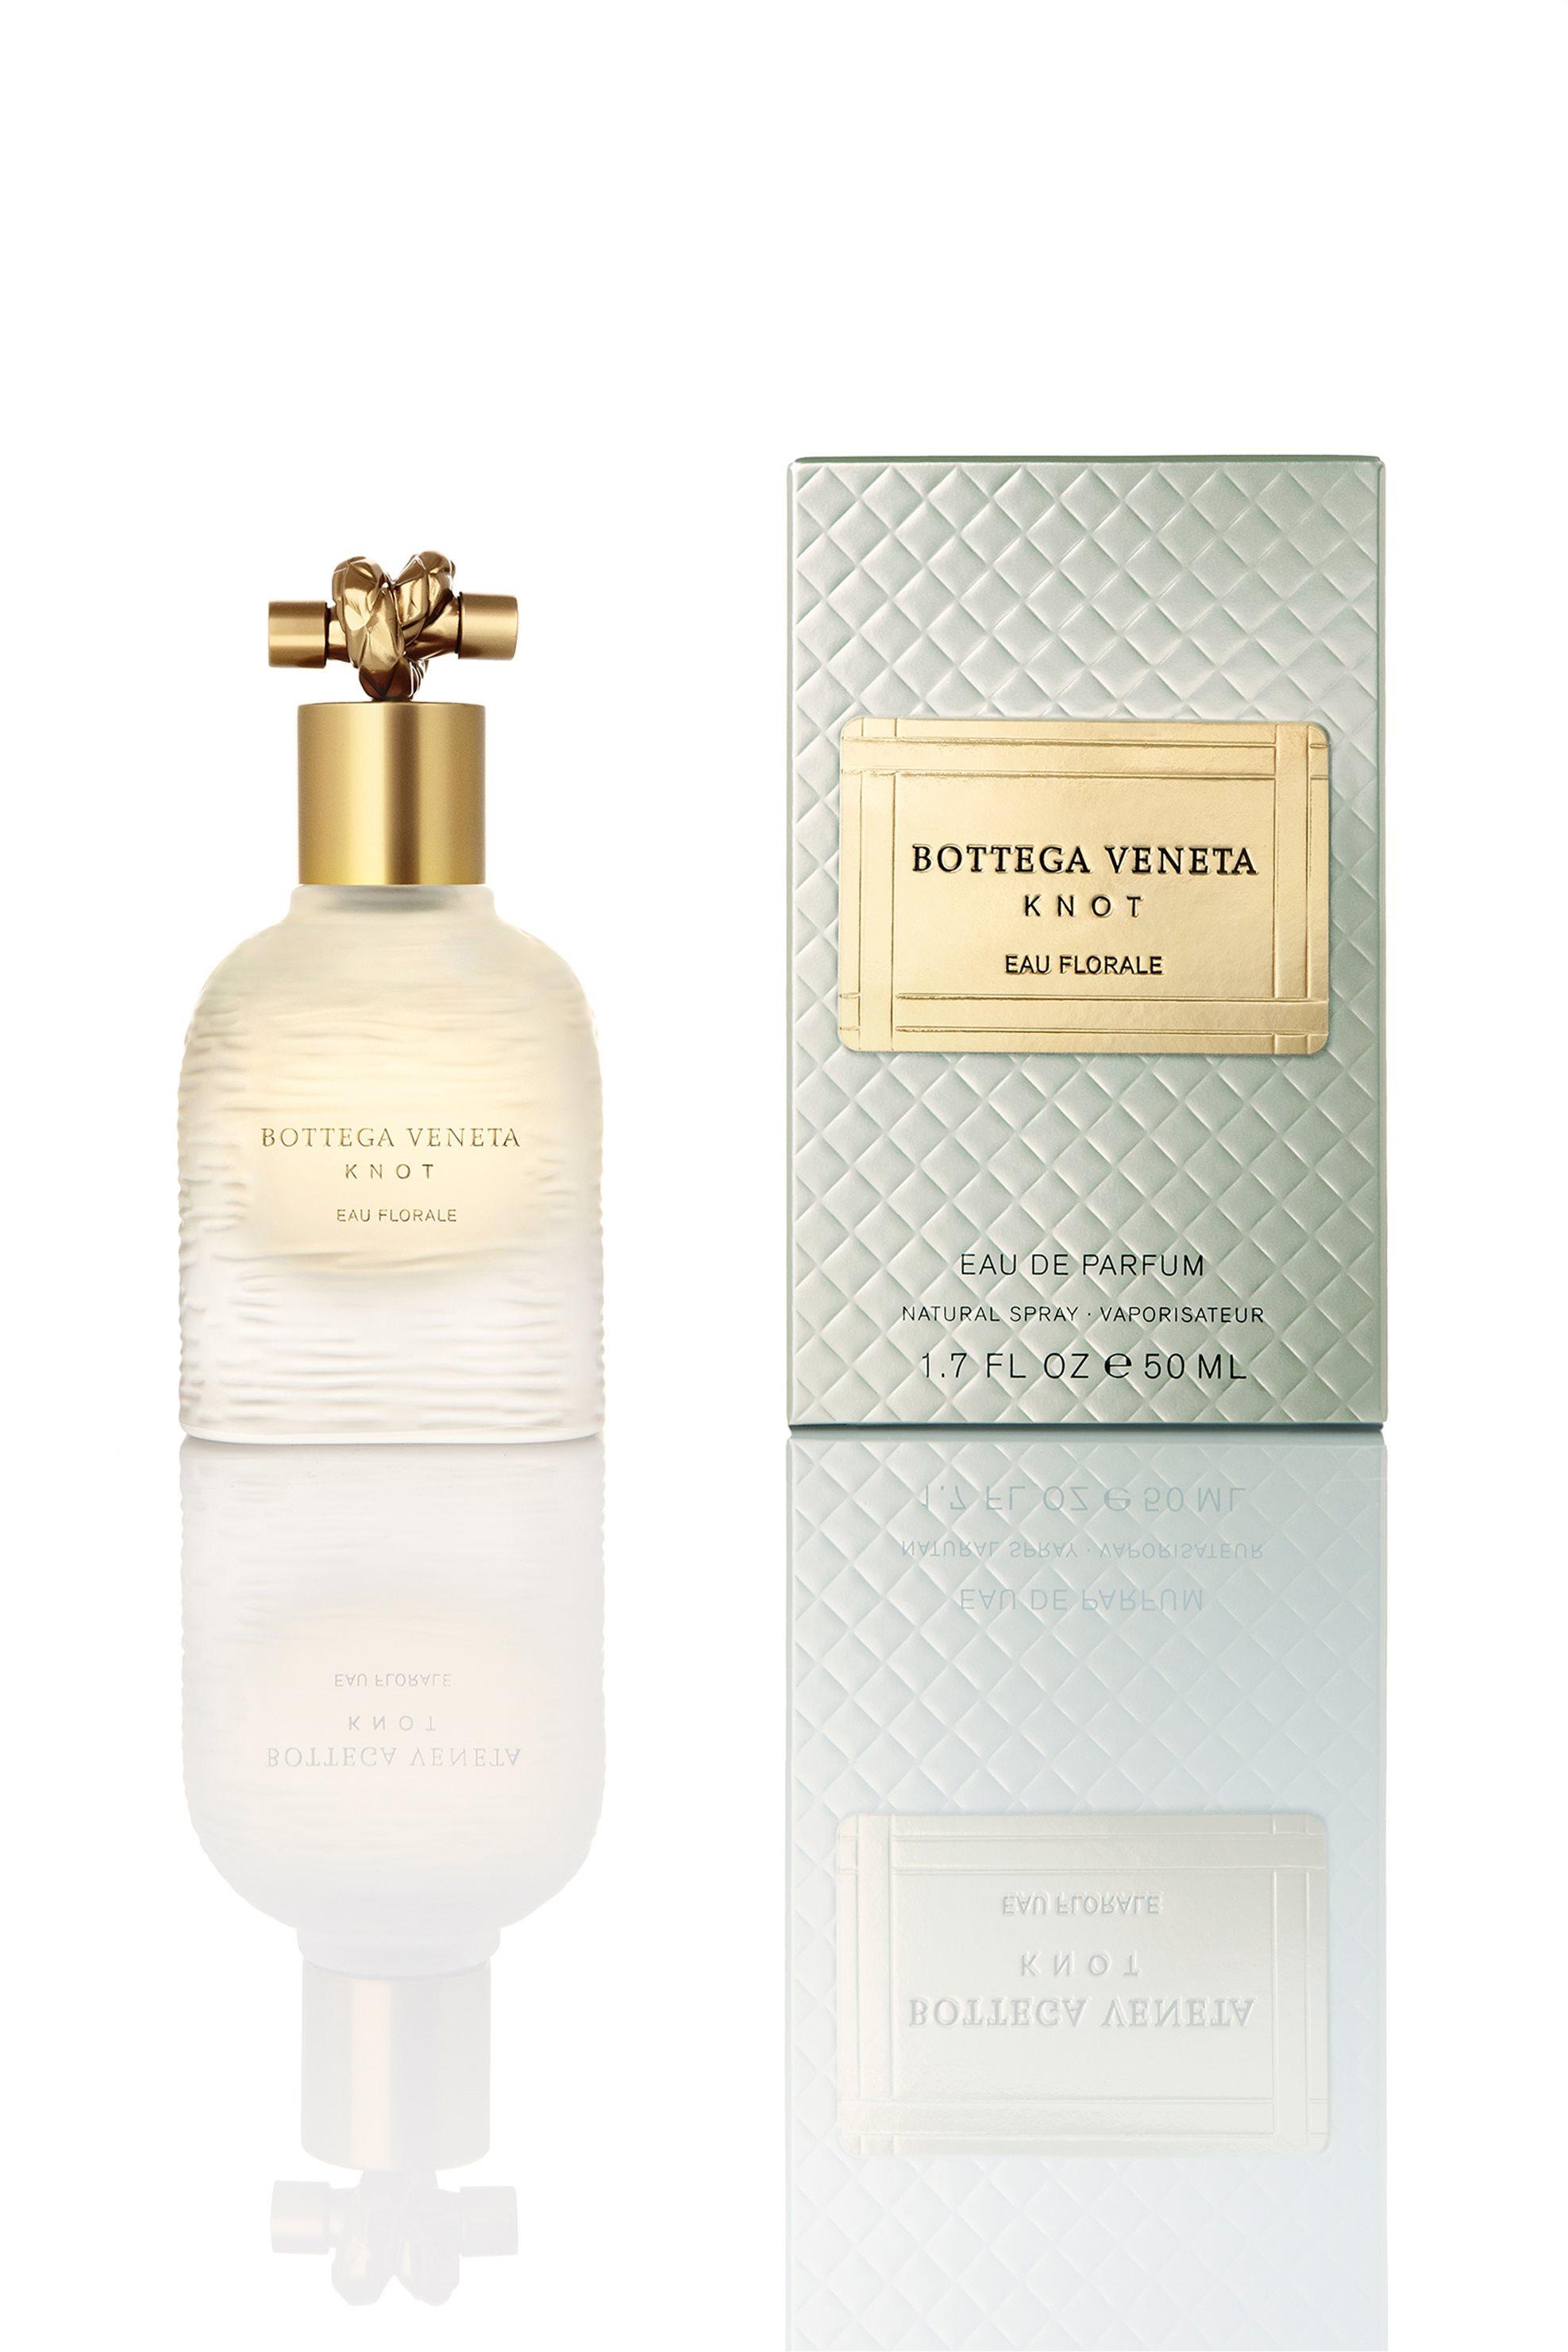 Bottega Veneta Knot Eau Florale EdP 50 ml - 1429923 ομορφια   καλλυντικα επιλεκτικησ   αρώματα   γυναικεία αρώματα   eau de parfum